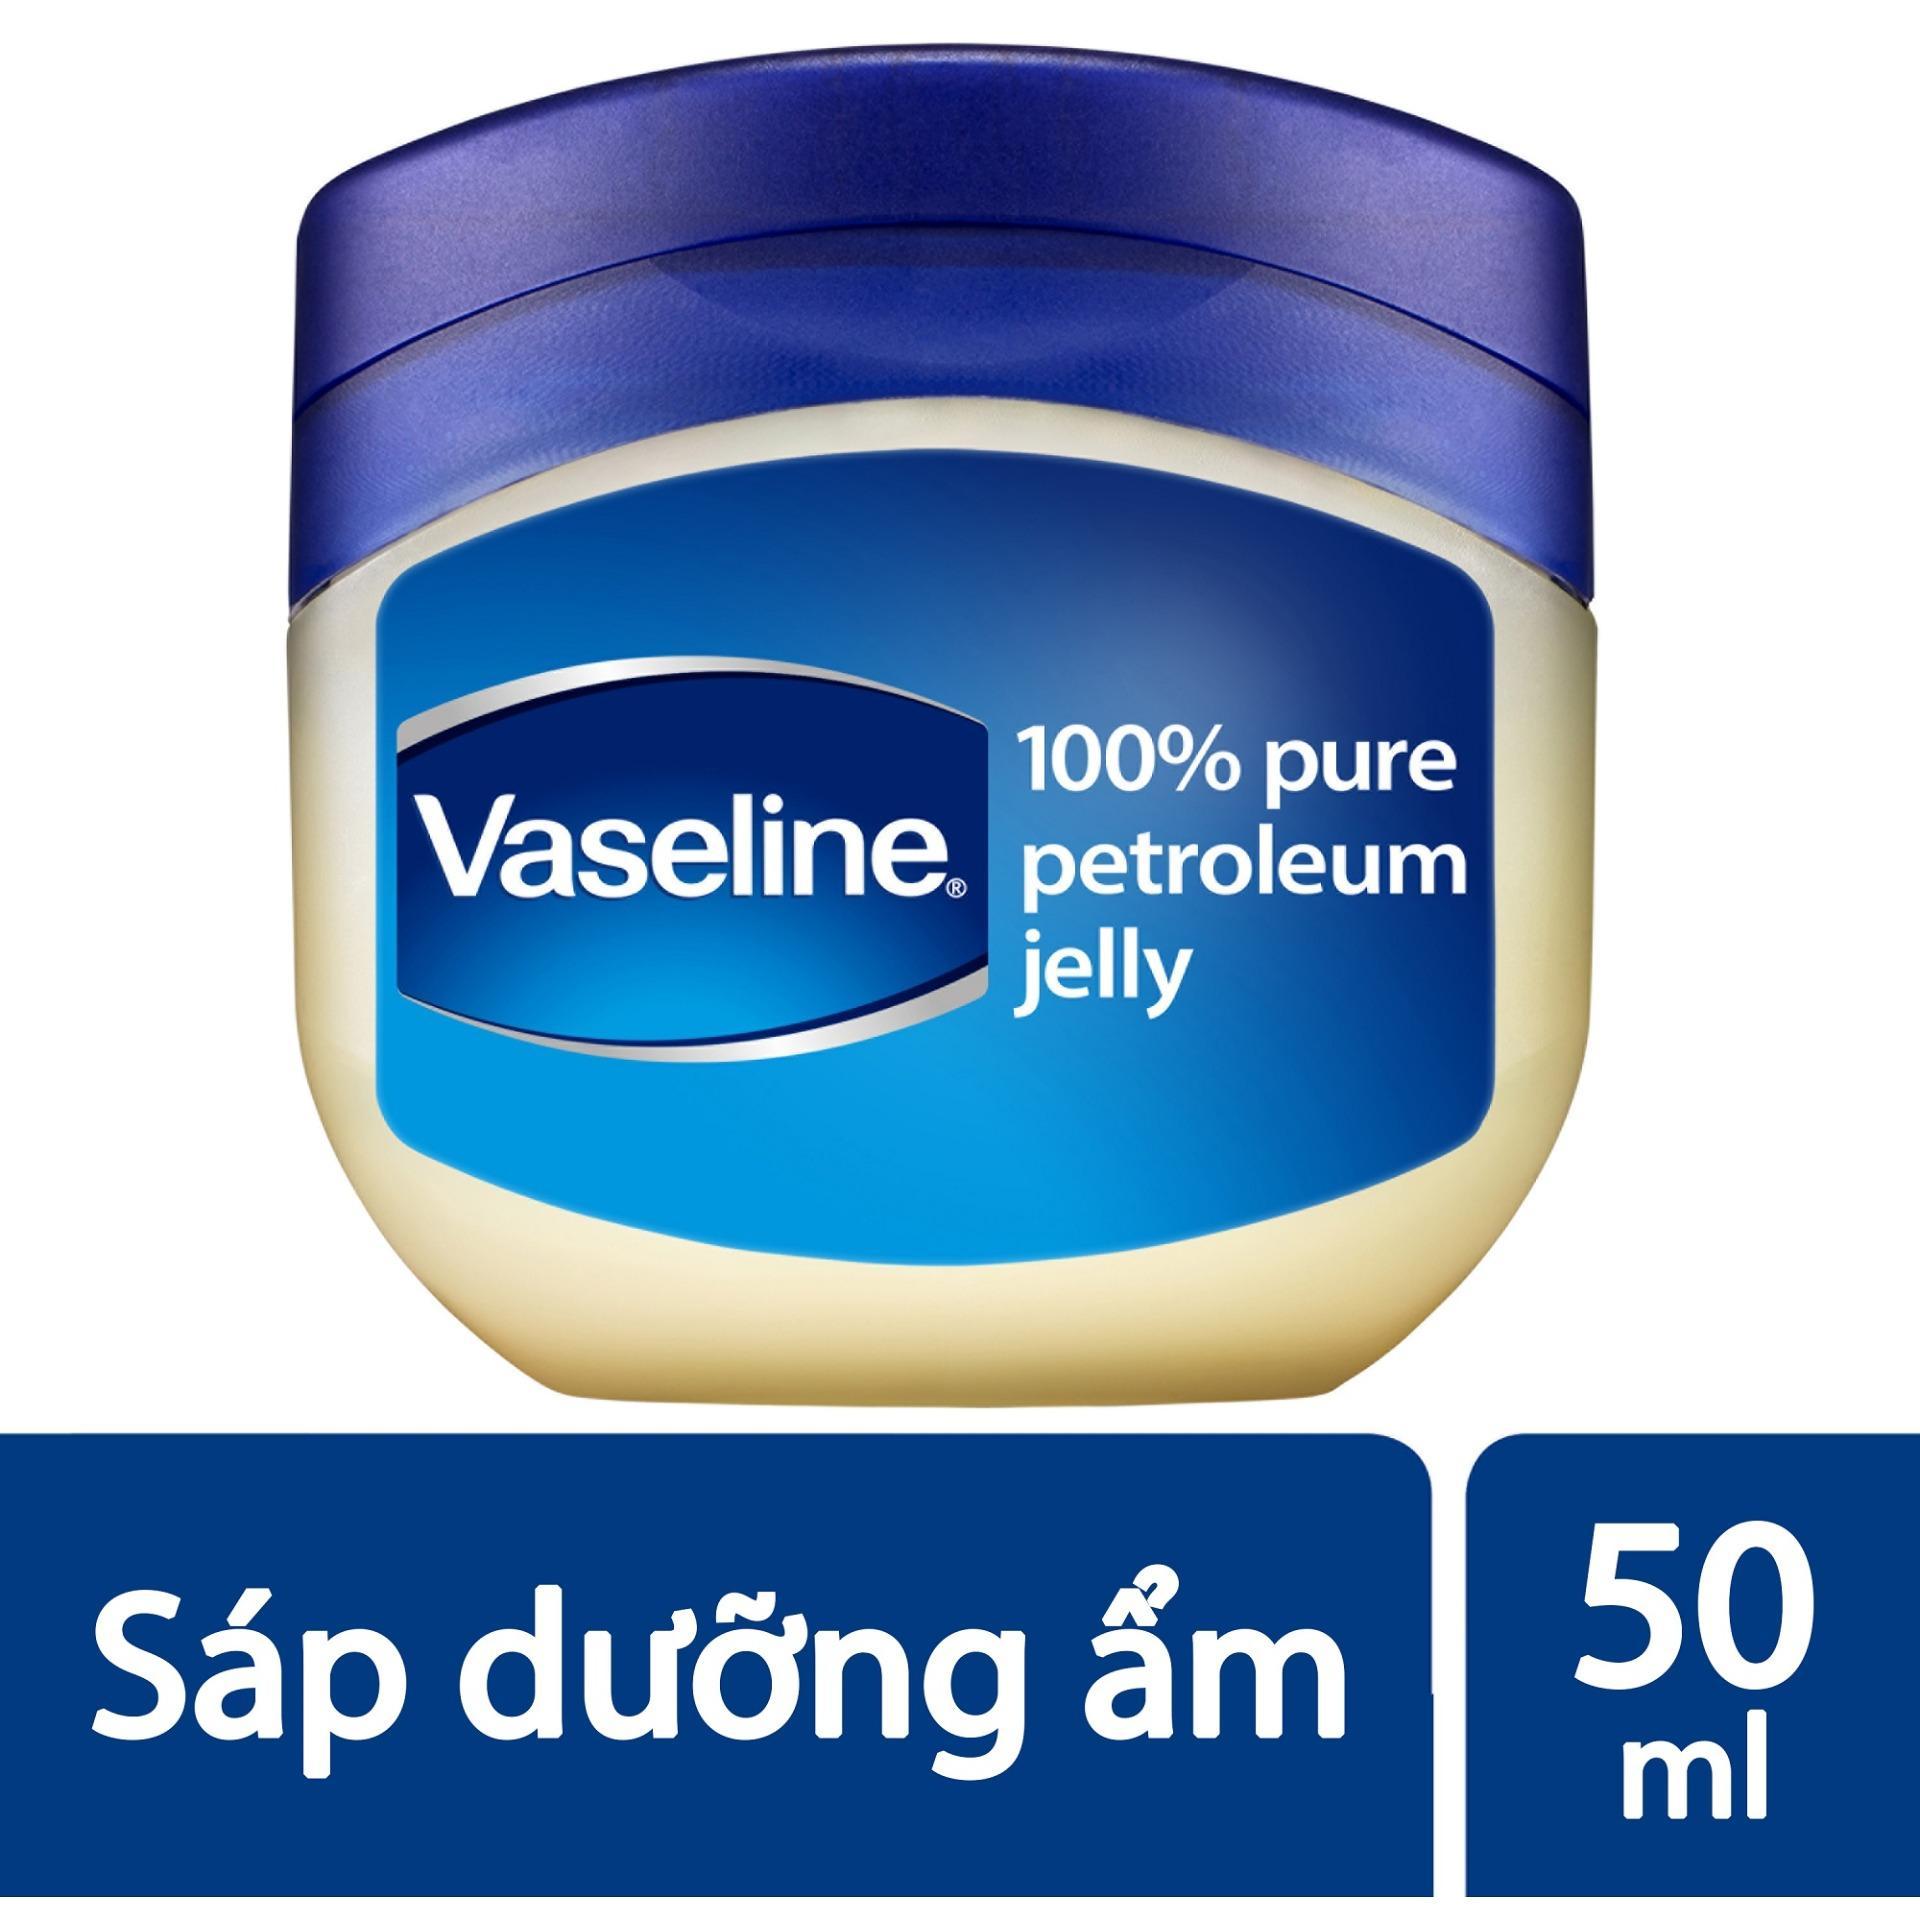 Sáp dưỡng ẩm Vaseline 50ml nhập khẩu